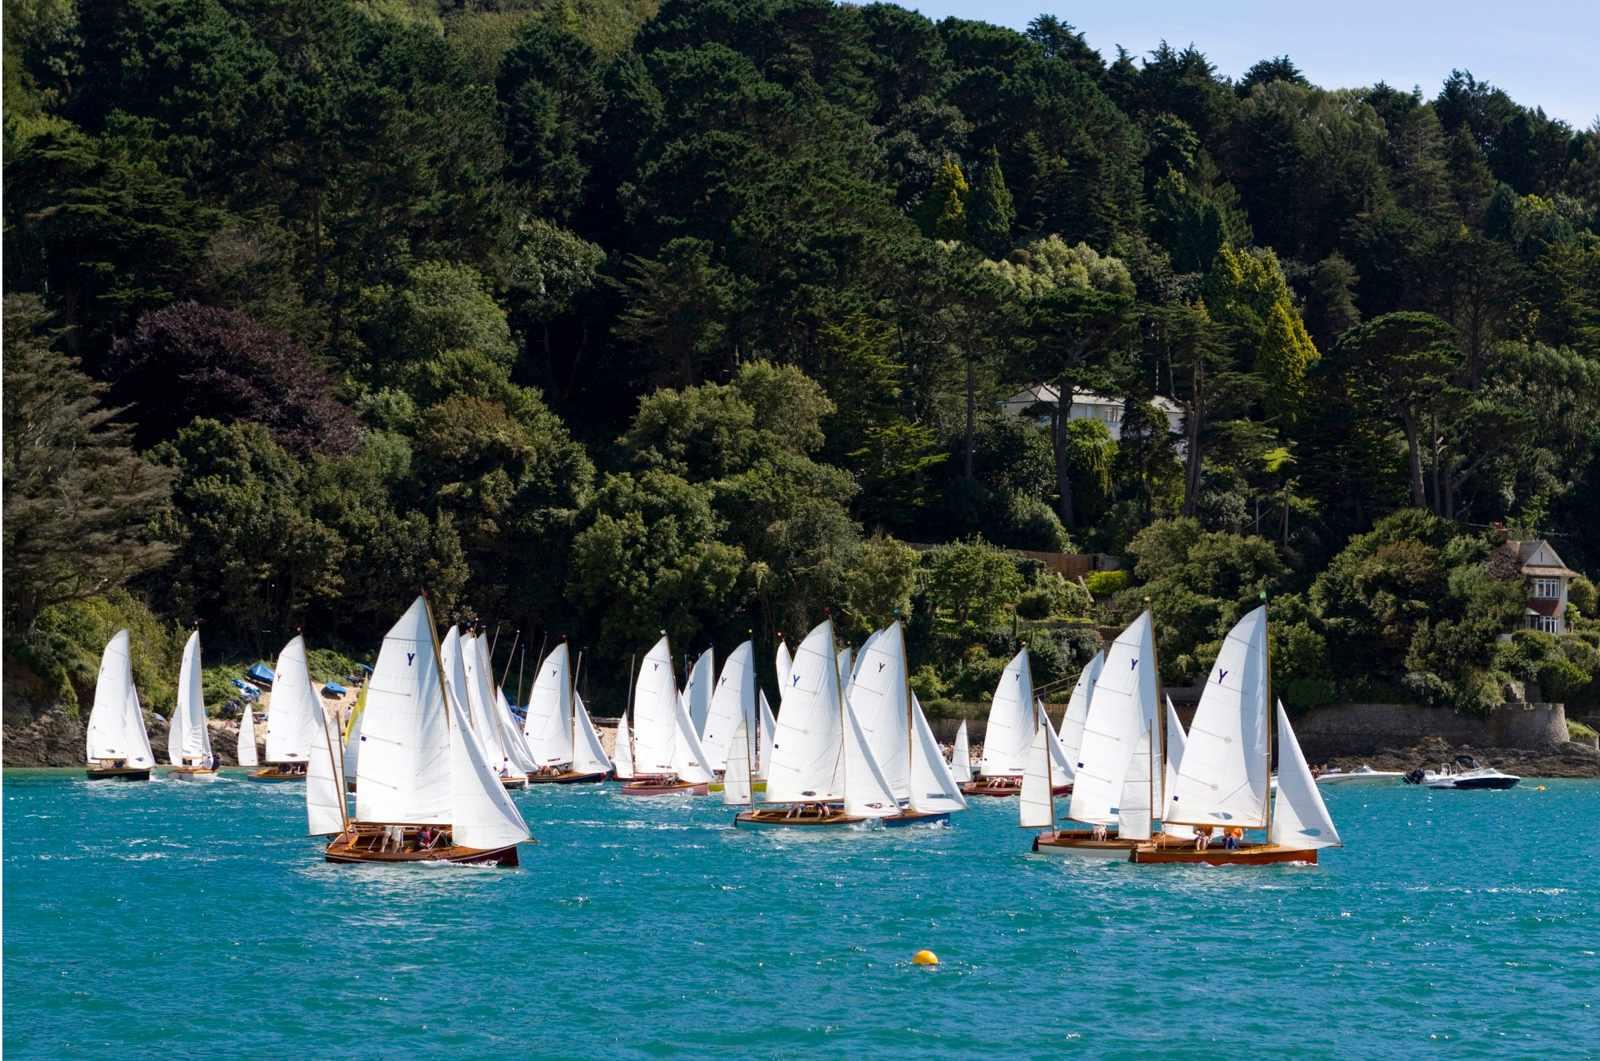 Yawl class sailboats racing in beautiful estuary. Salcombe, Devon, UK.